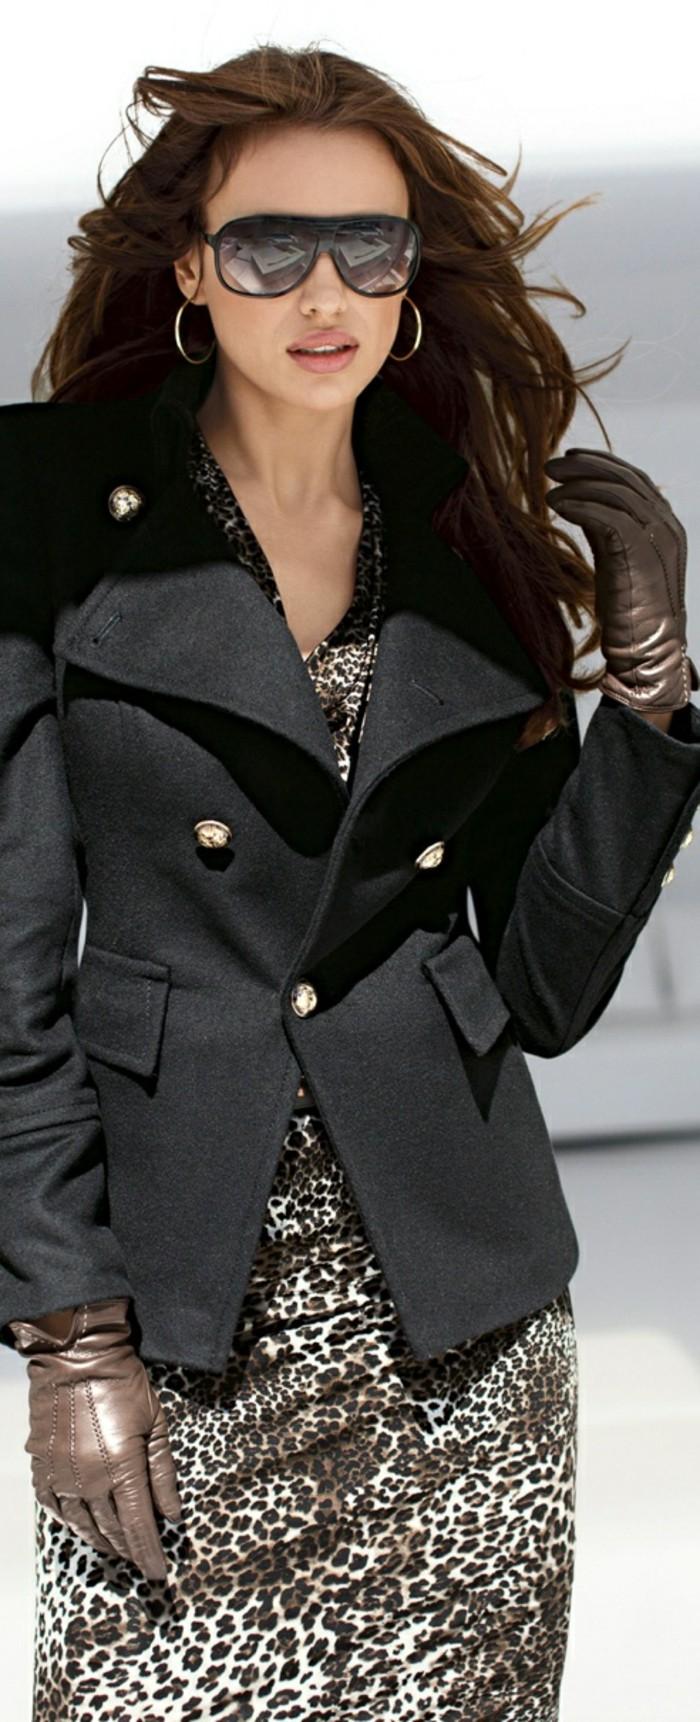 gant-chauffant-design-cuir-pas-cher-cuir-marron-moderne-femme-tendances-modernes